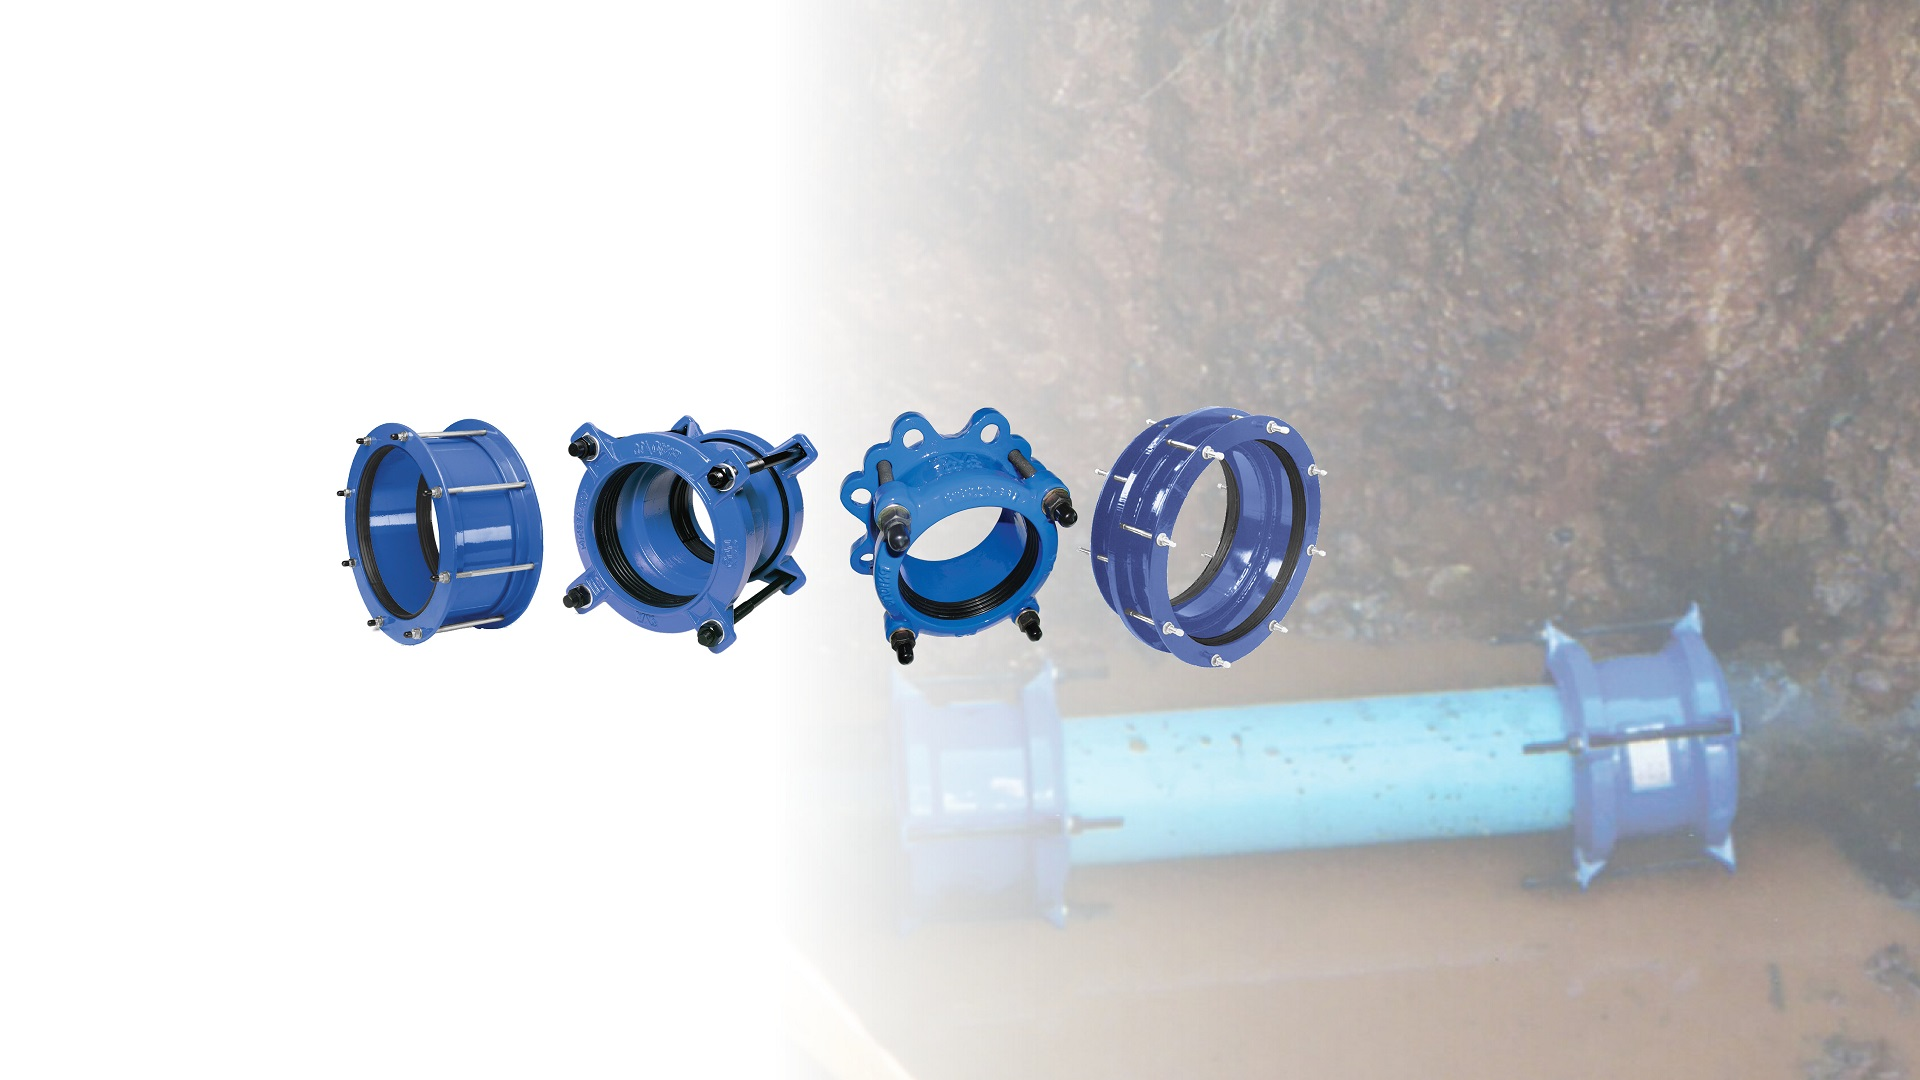 Flange adaptors and couplings